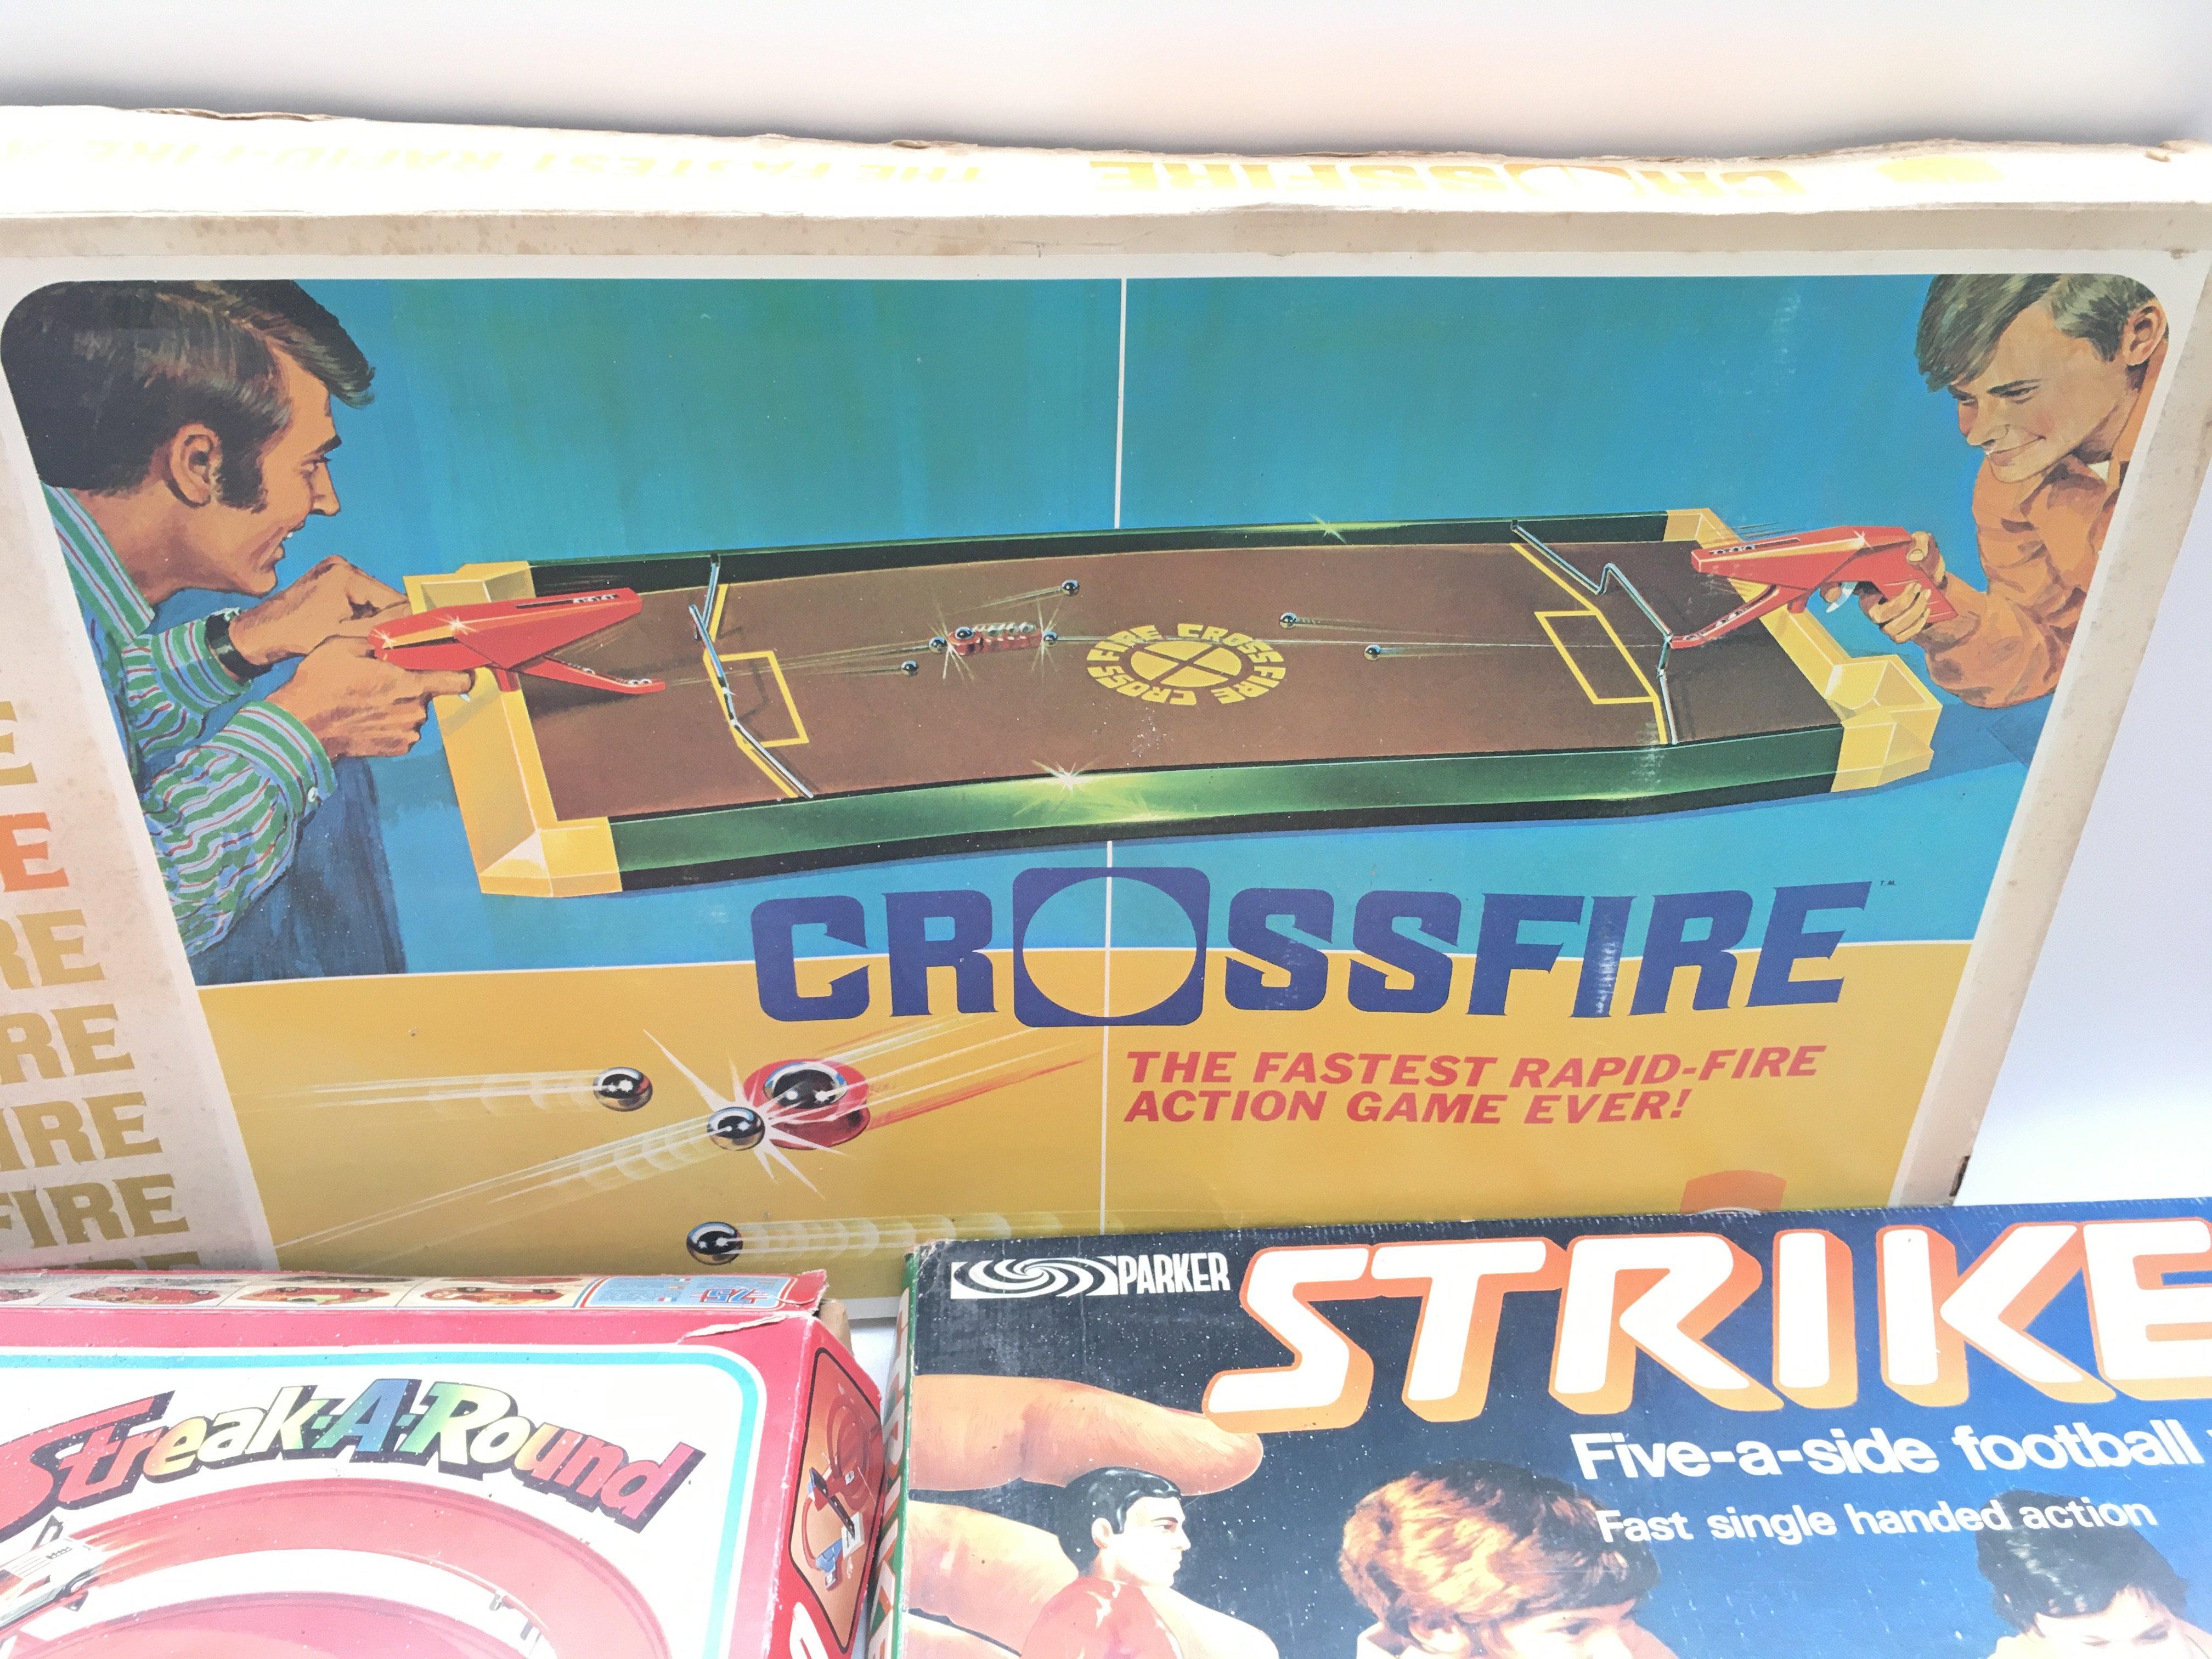 Collection of games including Matchbox. Striker. Arnold Palmer pro golf shot. Crossfire. - Image 4 of 9